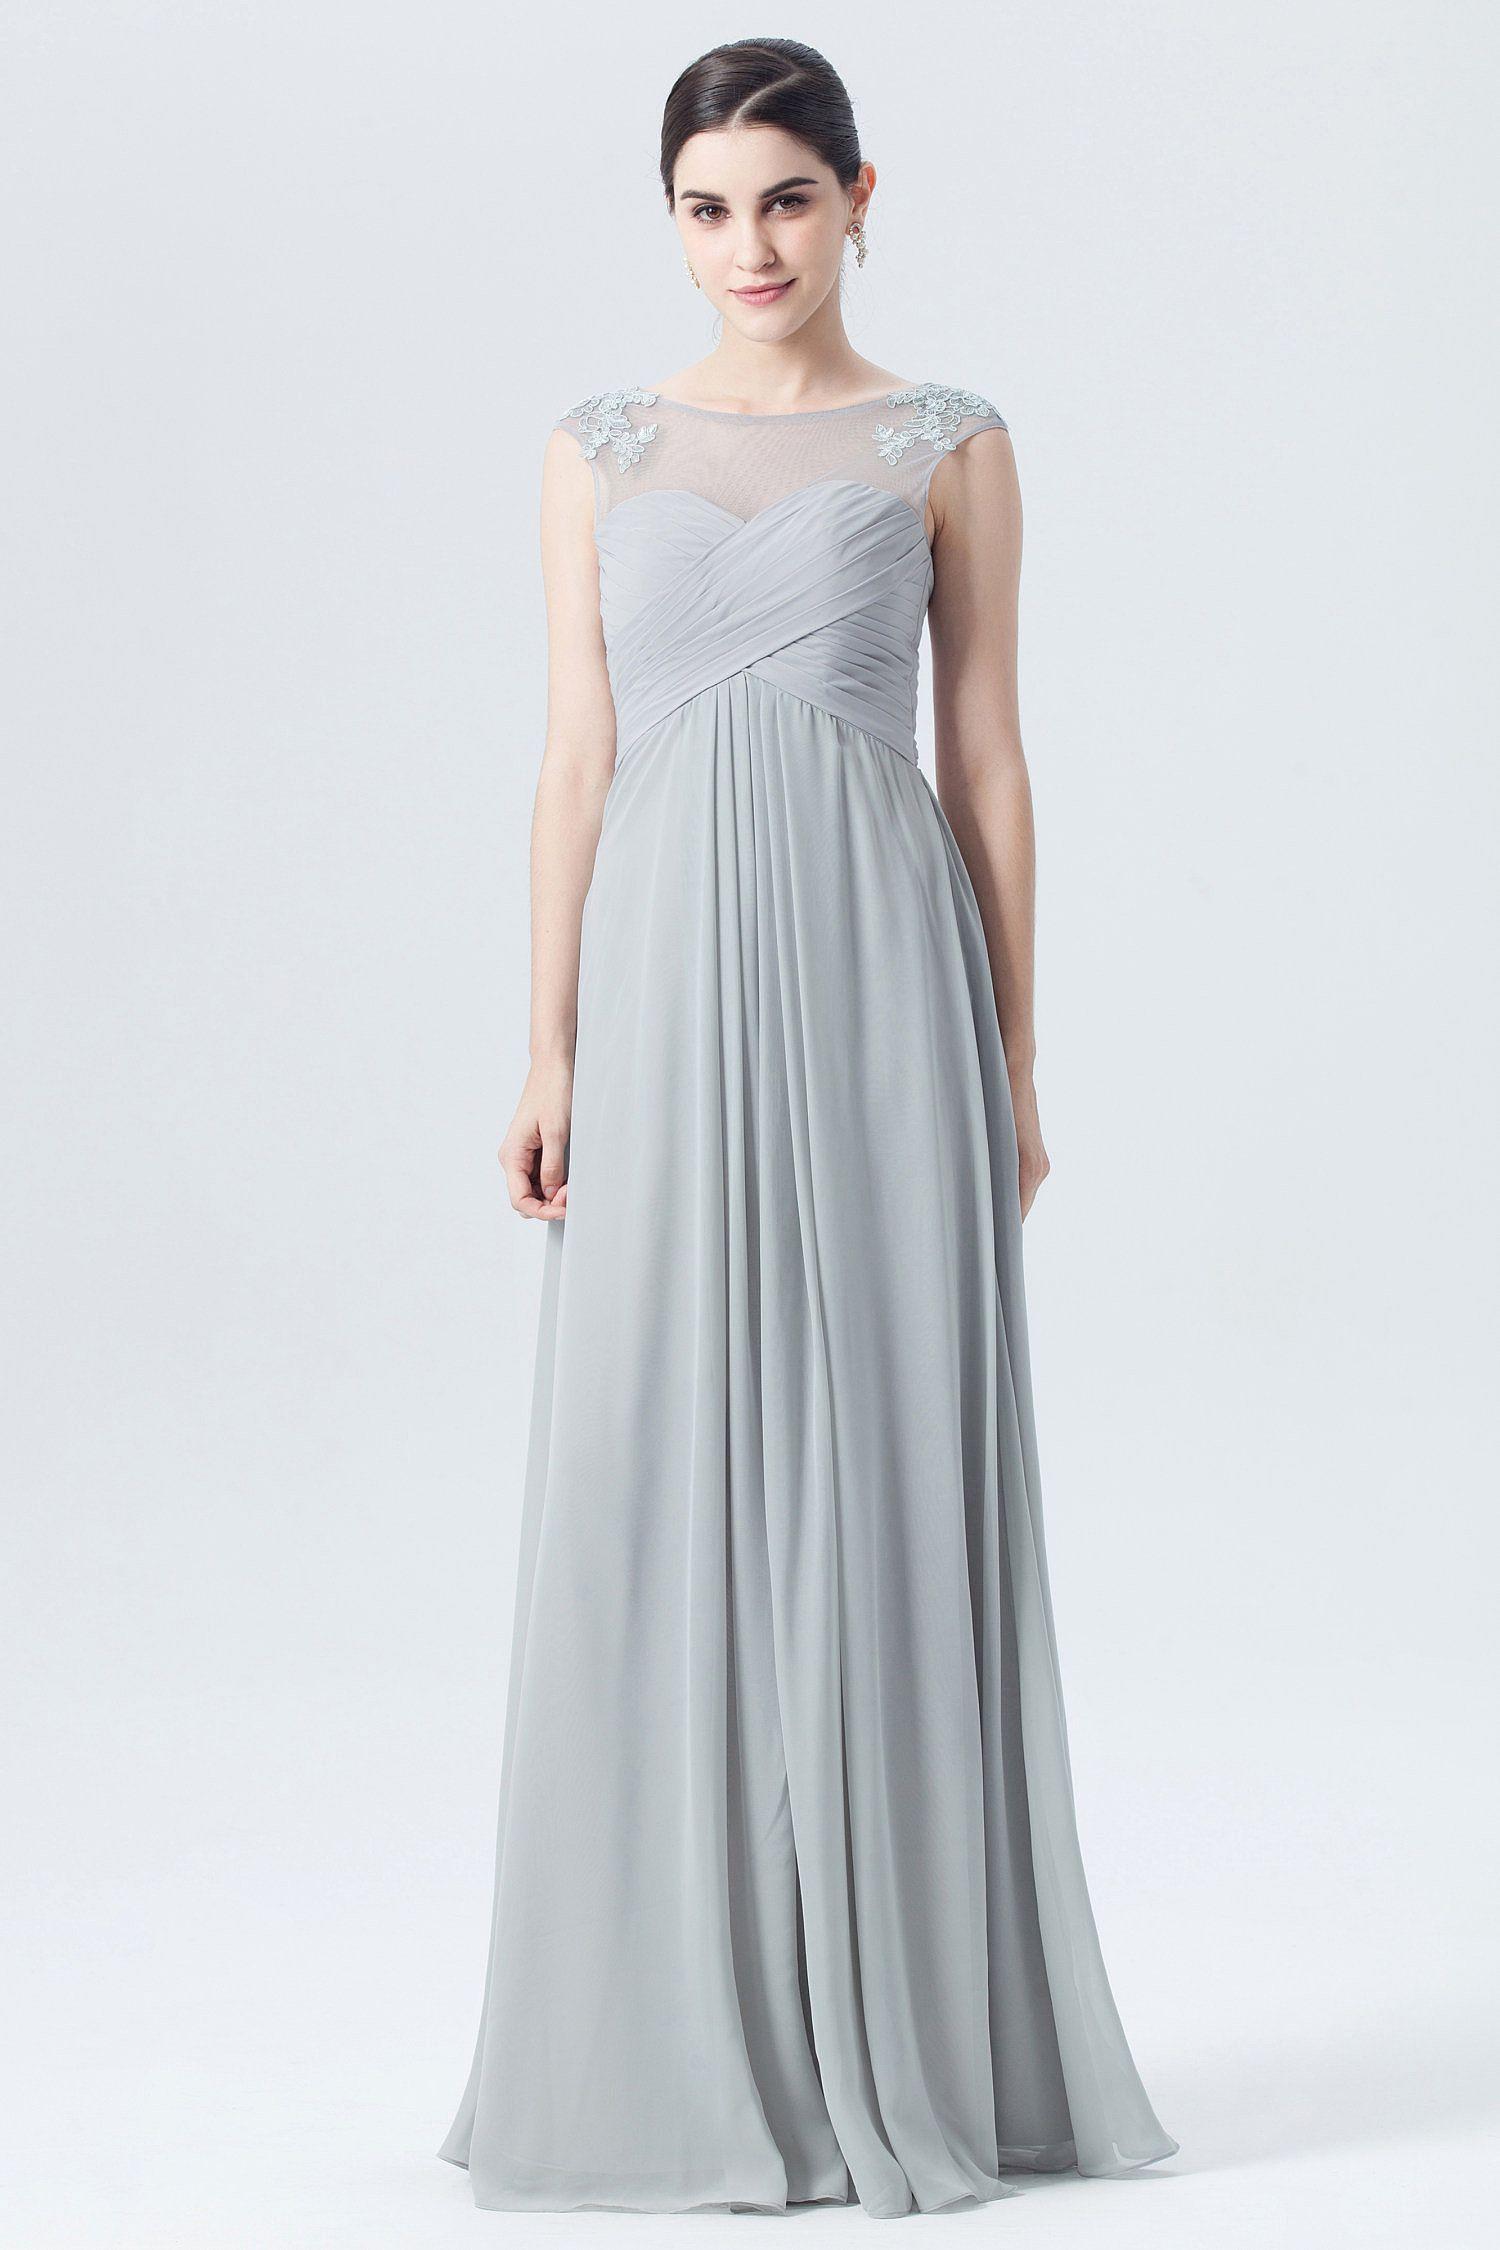 14eeba7f84a3a Long Silver Chiffon Bridesmaid Dresses - raveitsafe